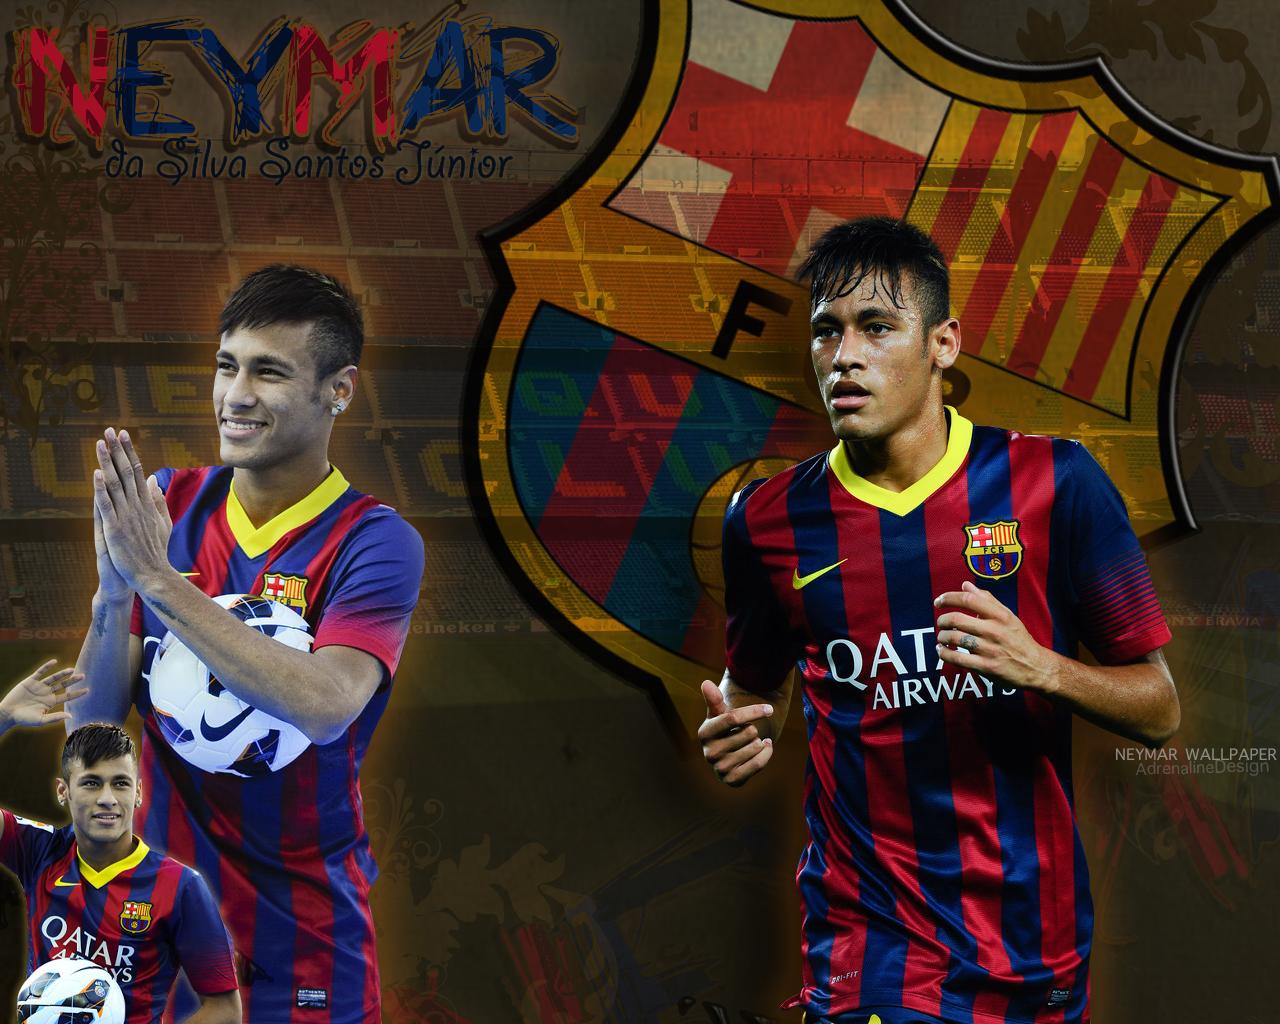 Neymar Fc Barcelona Wallpaper by AdrenaliineDesign on ...